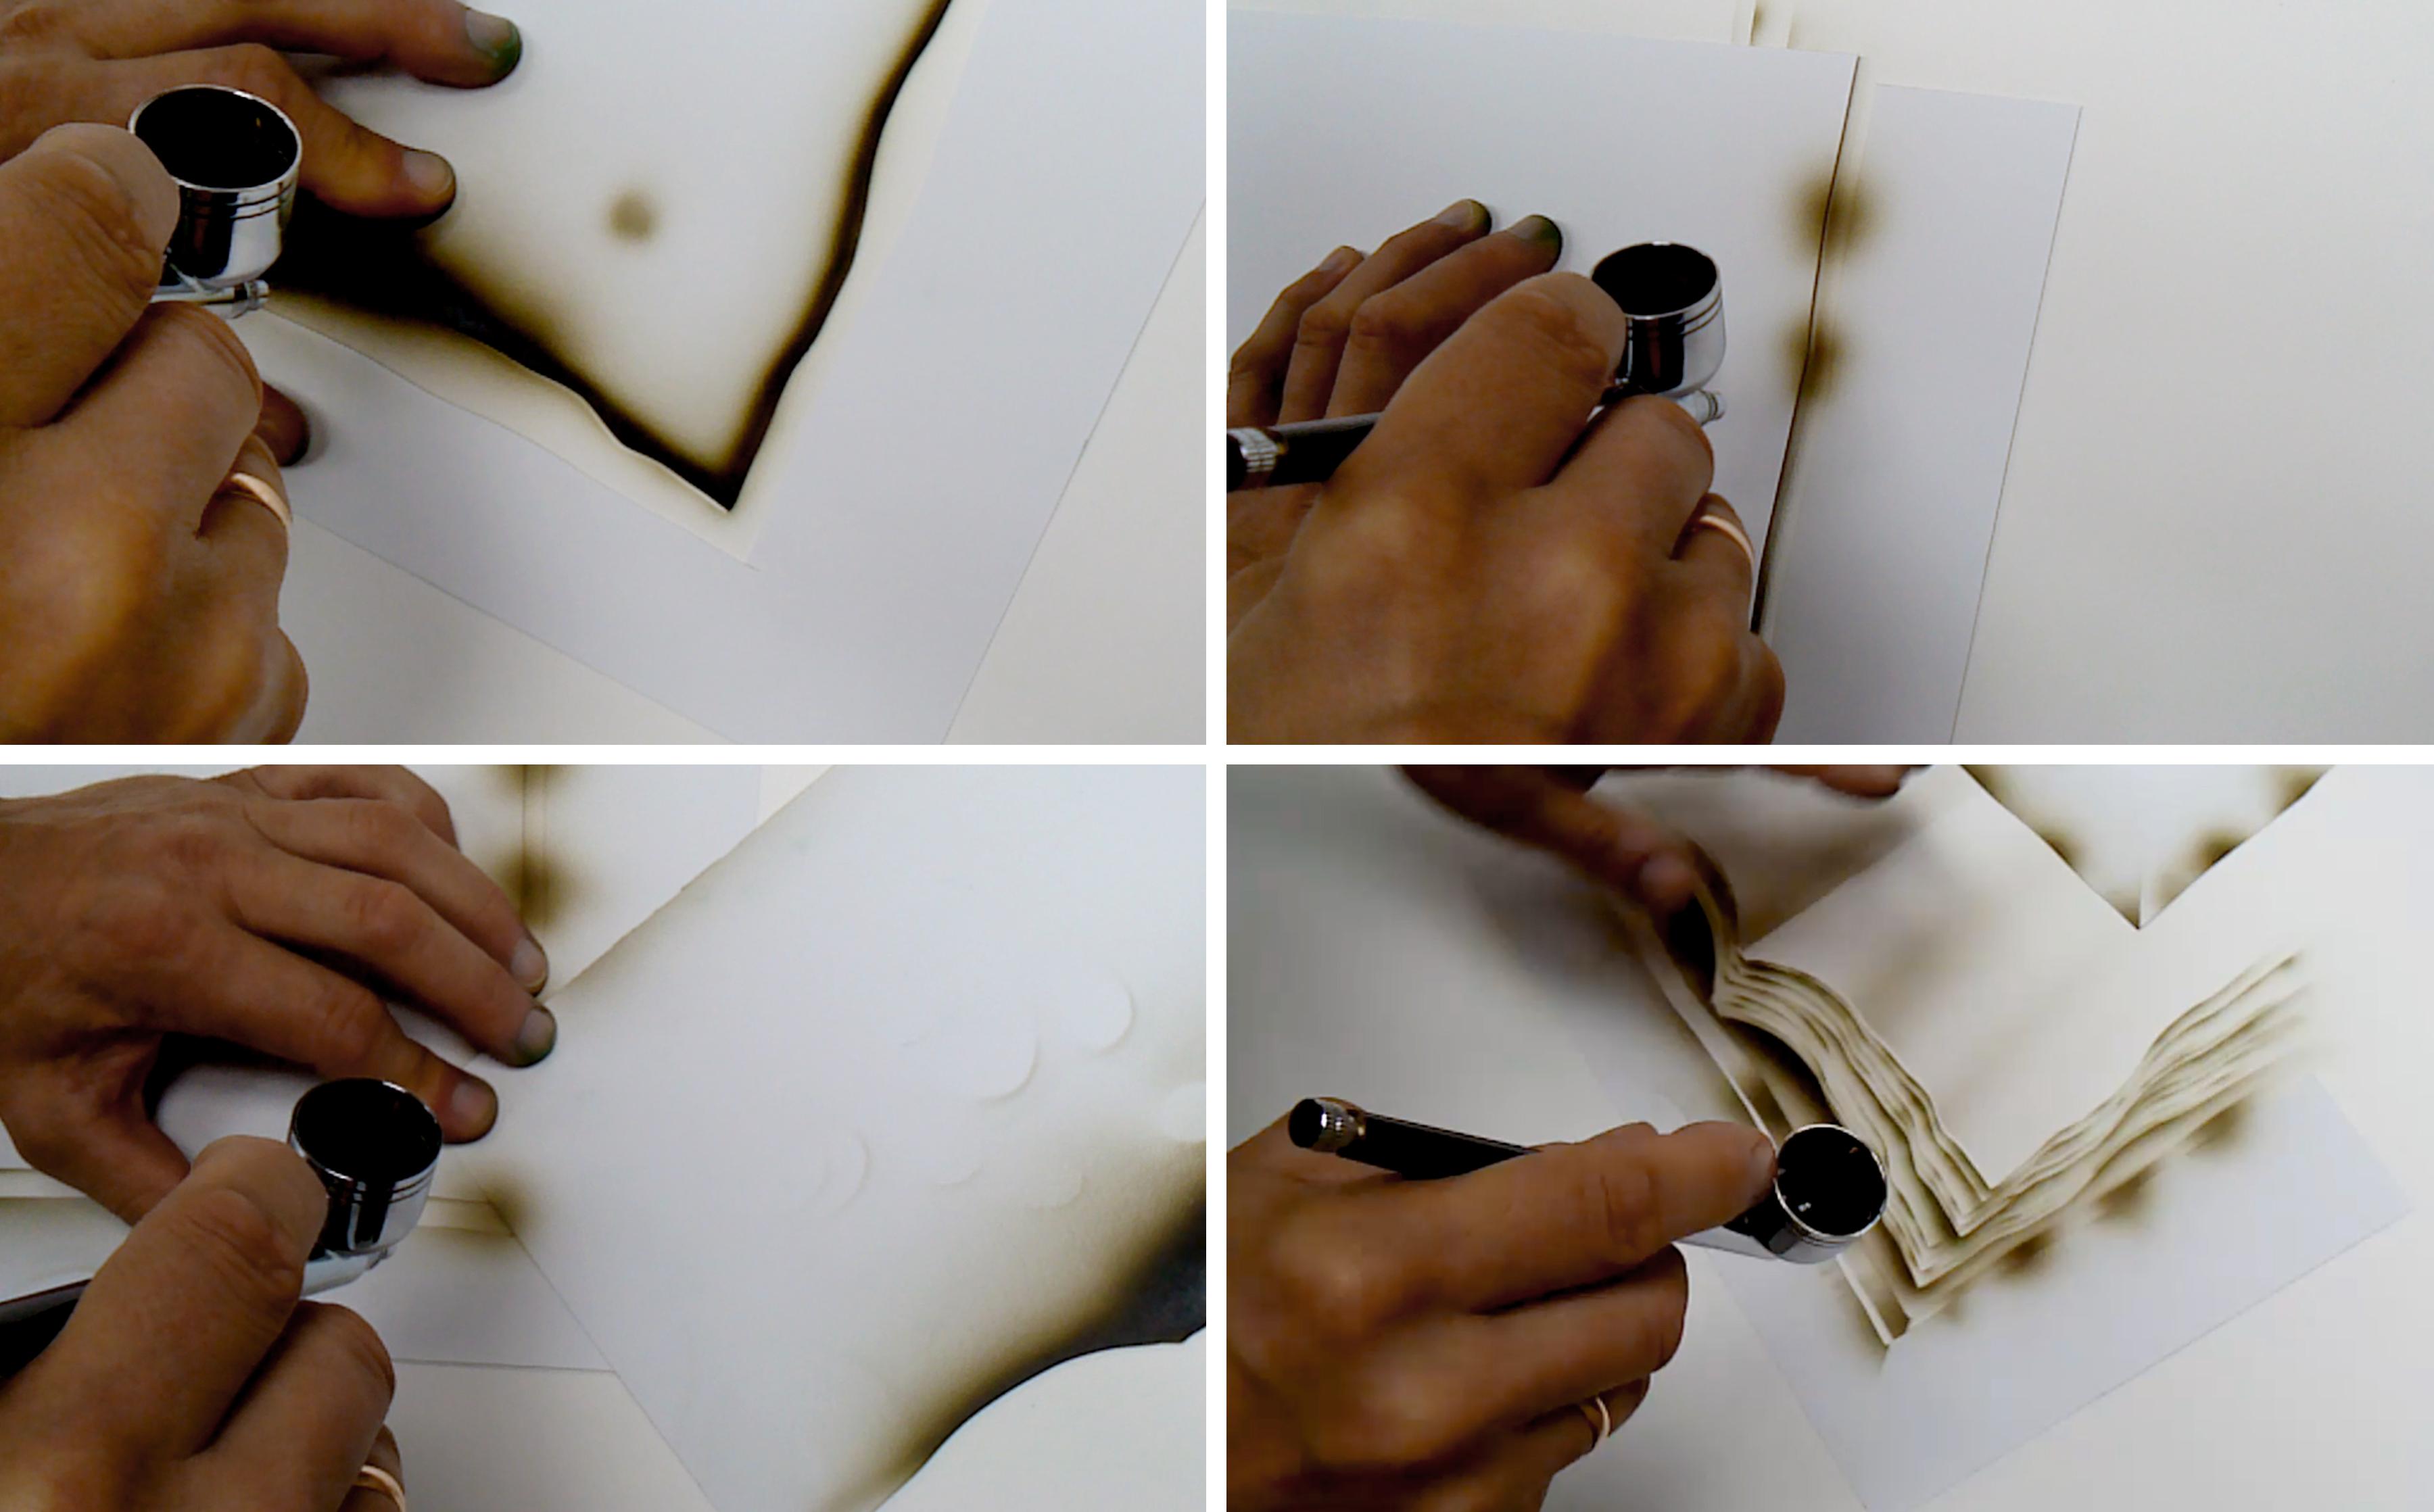 Airbrush & Design - Karpiński, airbrush